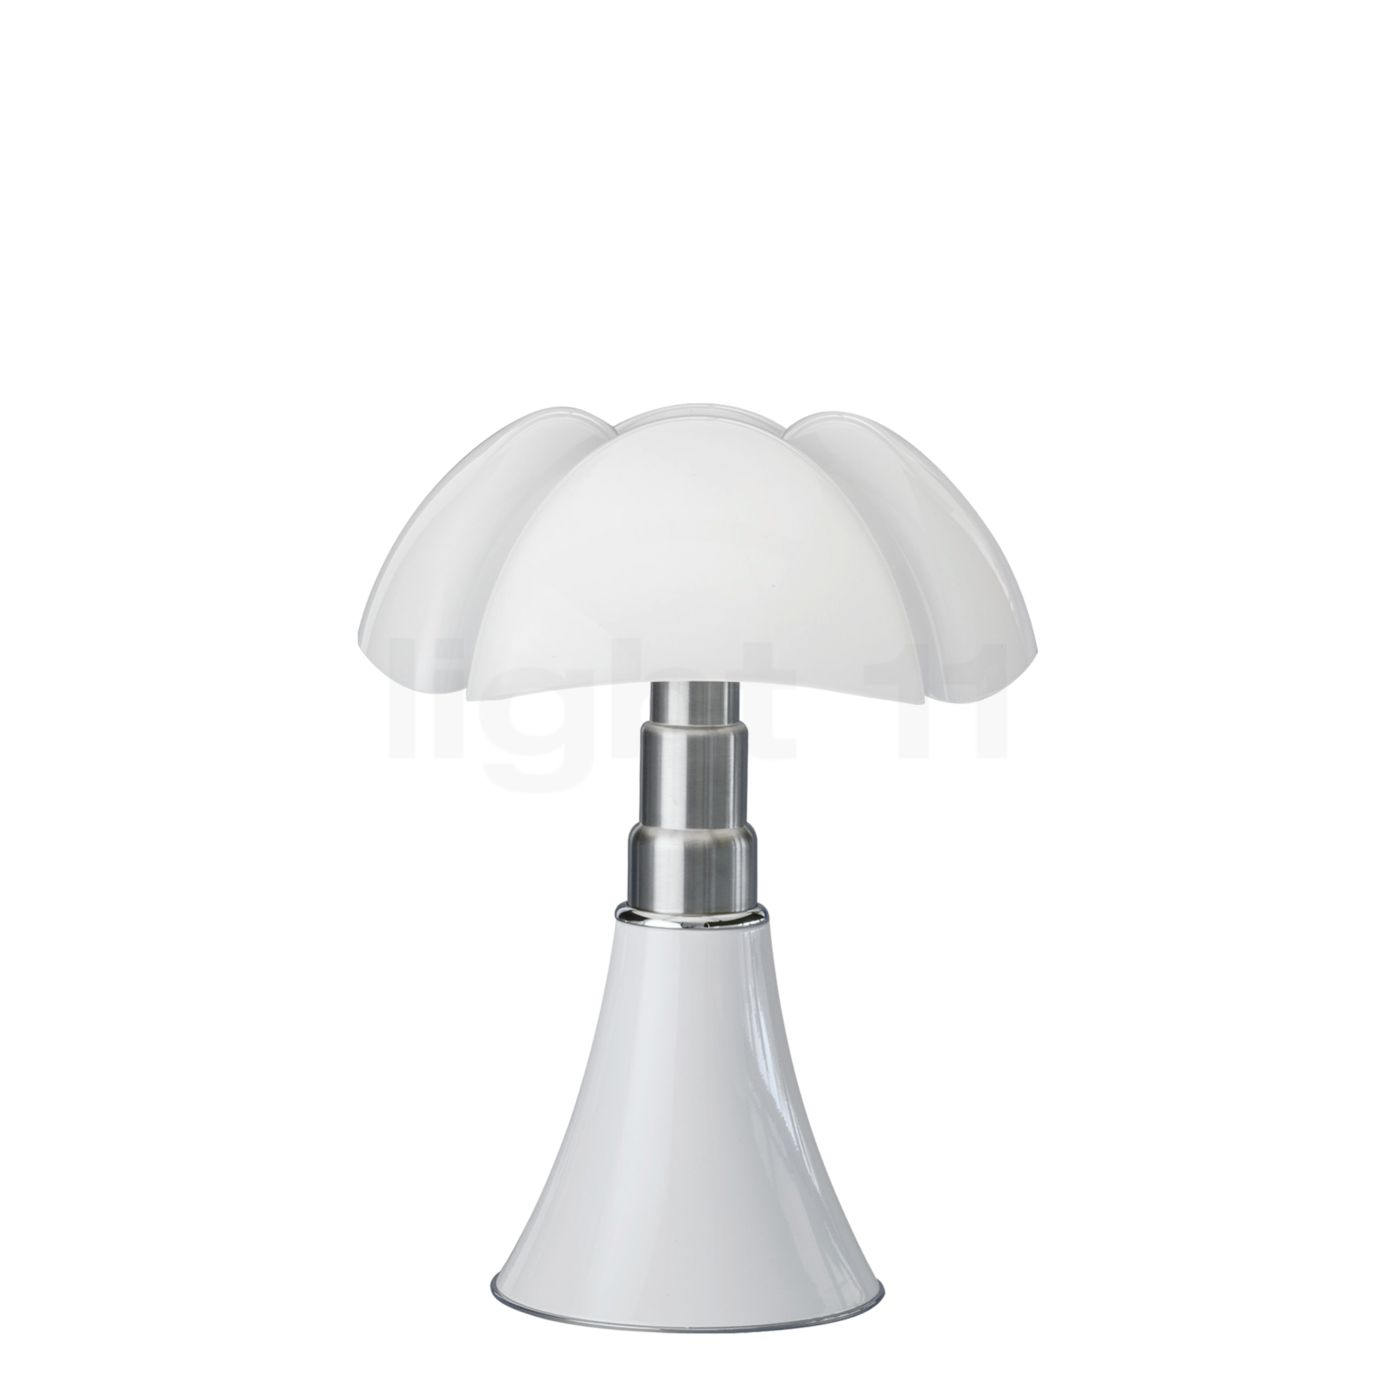 Martinelli Luce Minipipistrello LED Table lamp Bedside table lamps